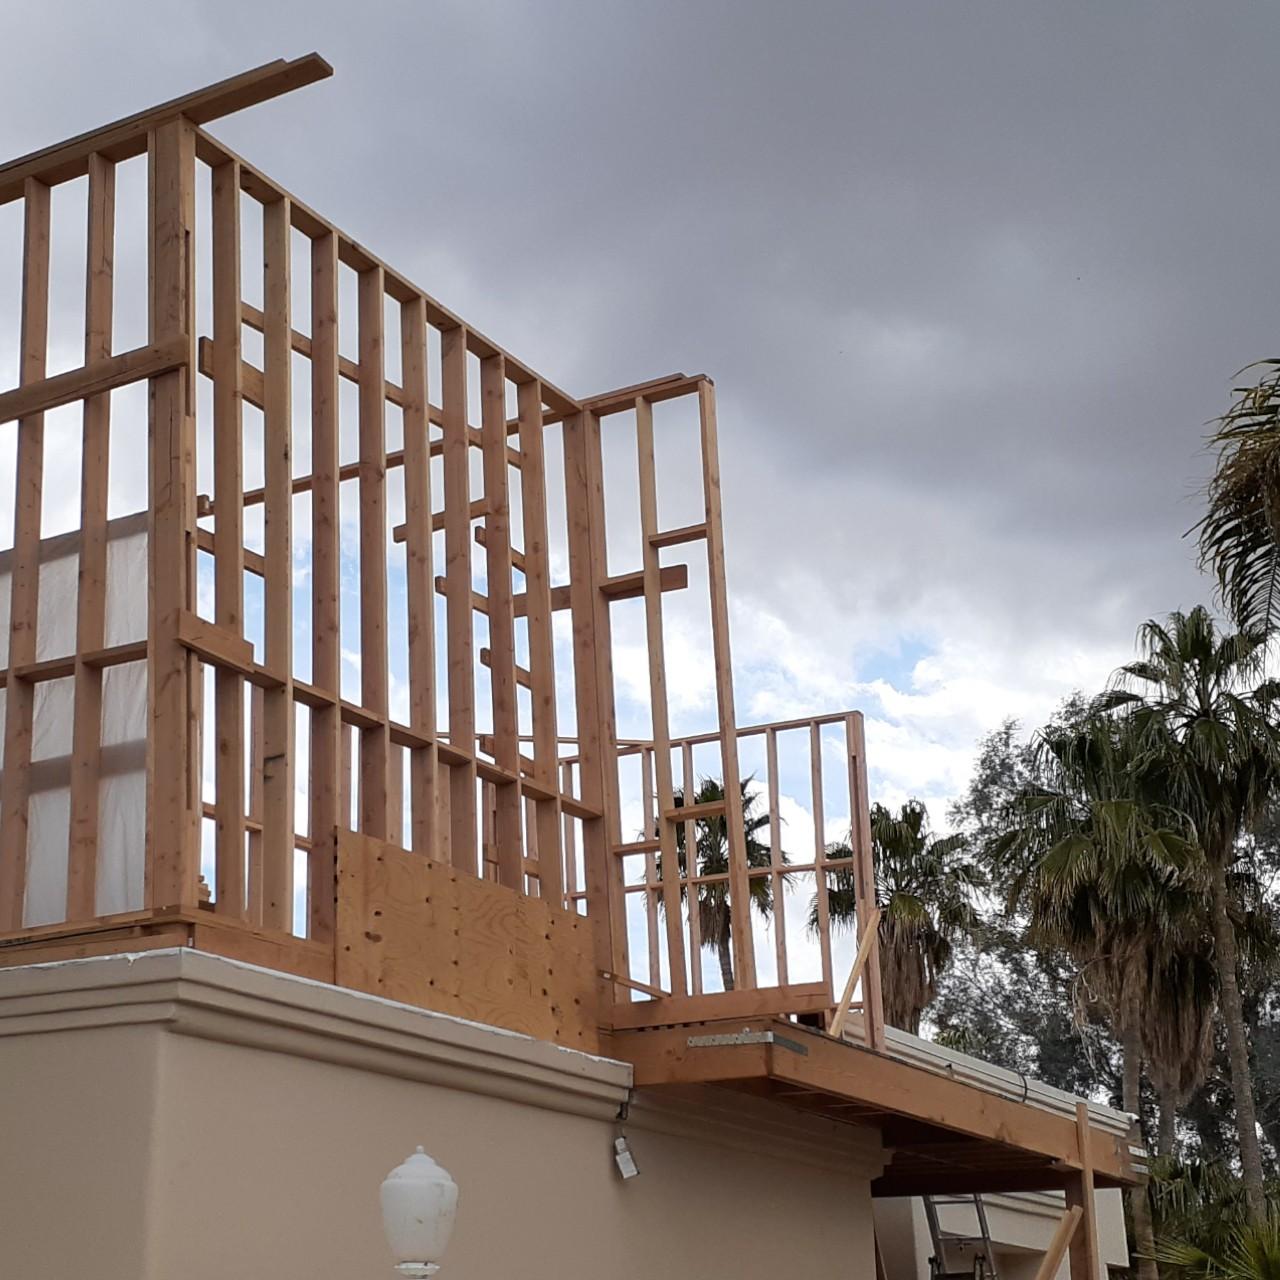 carpentry-wood-framing-second-floor-home-addition--framing-88